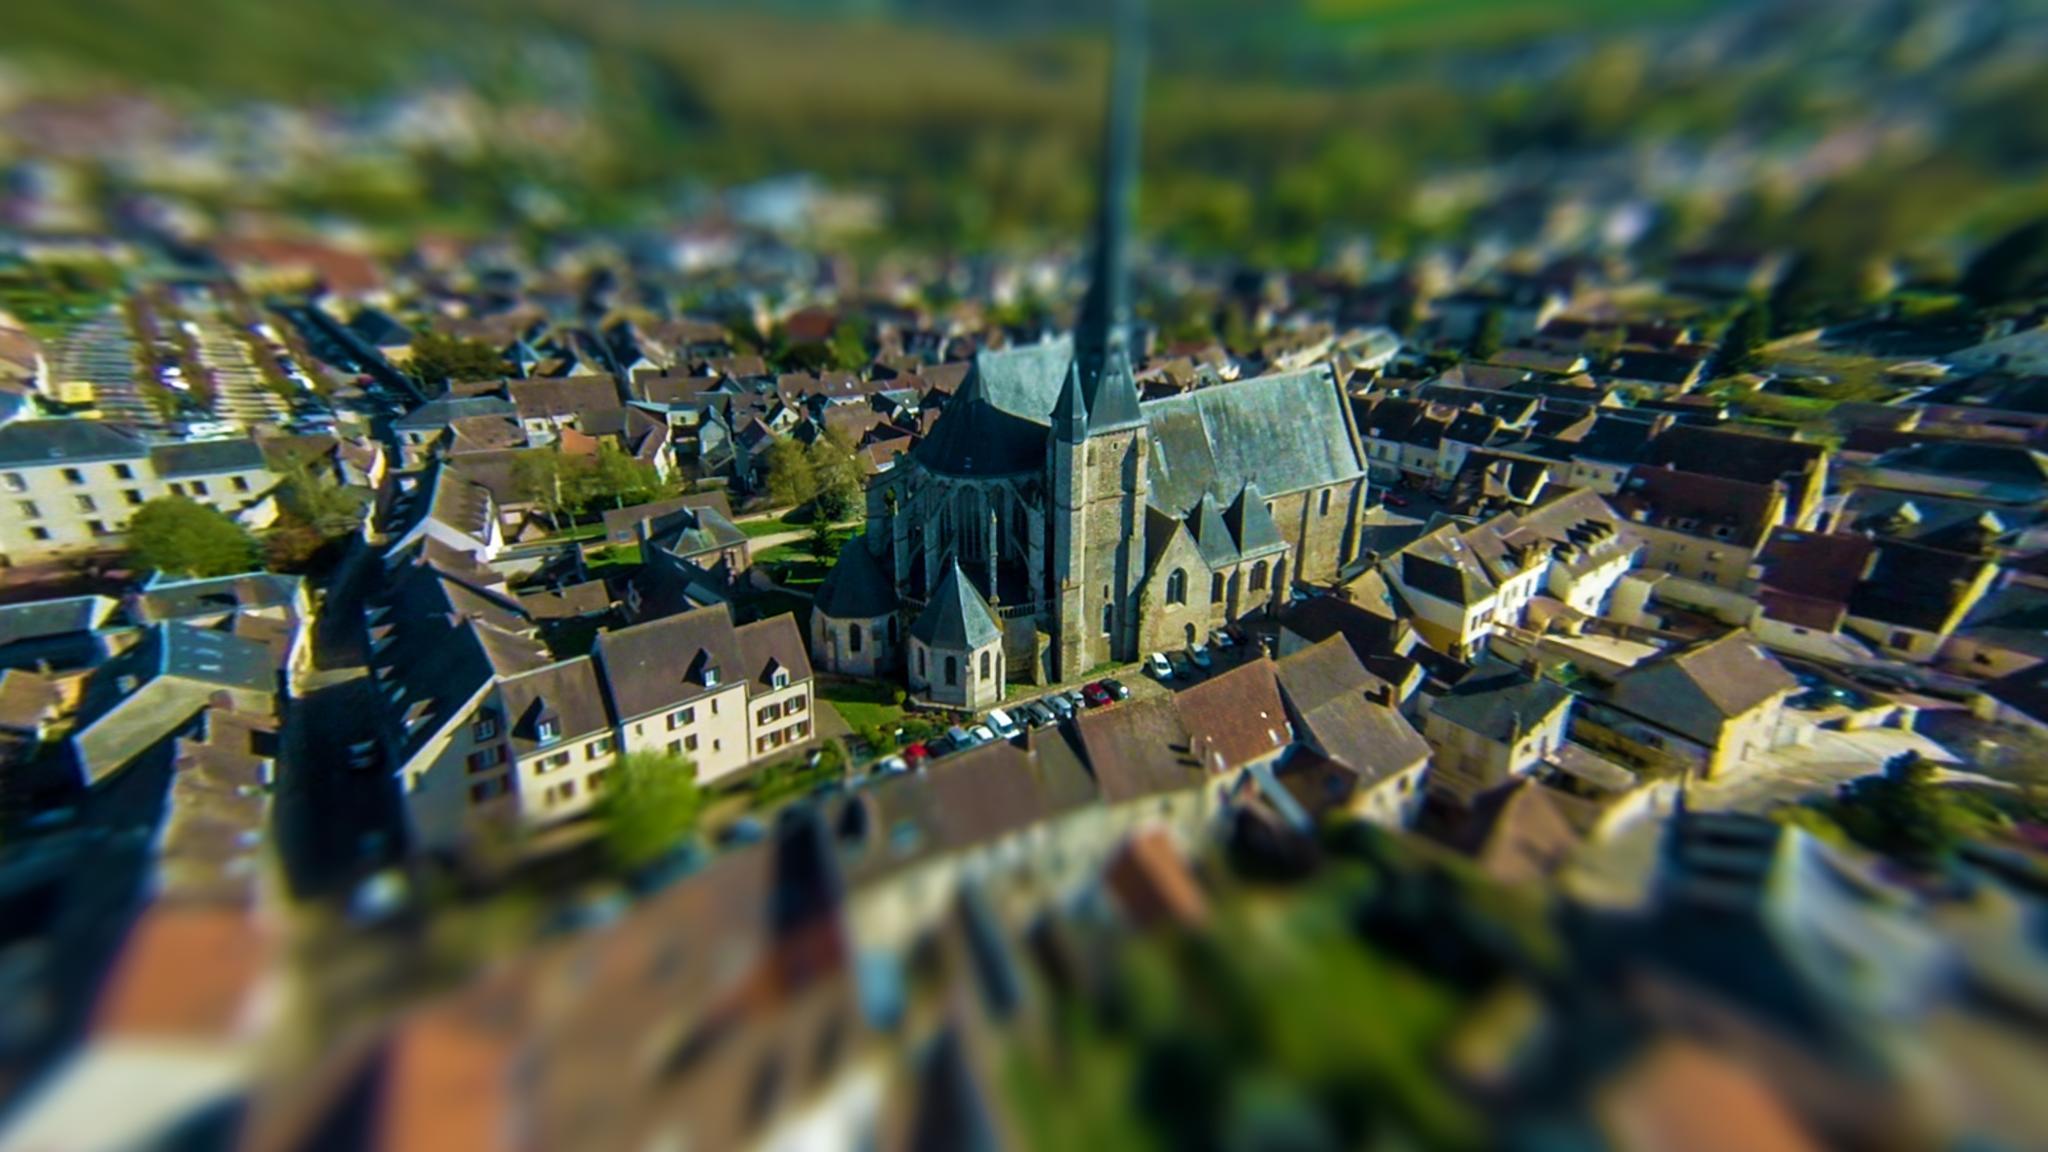 Eglise de Gallardon by XavierBERTRAND